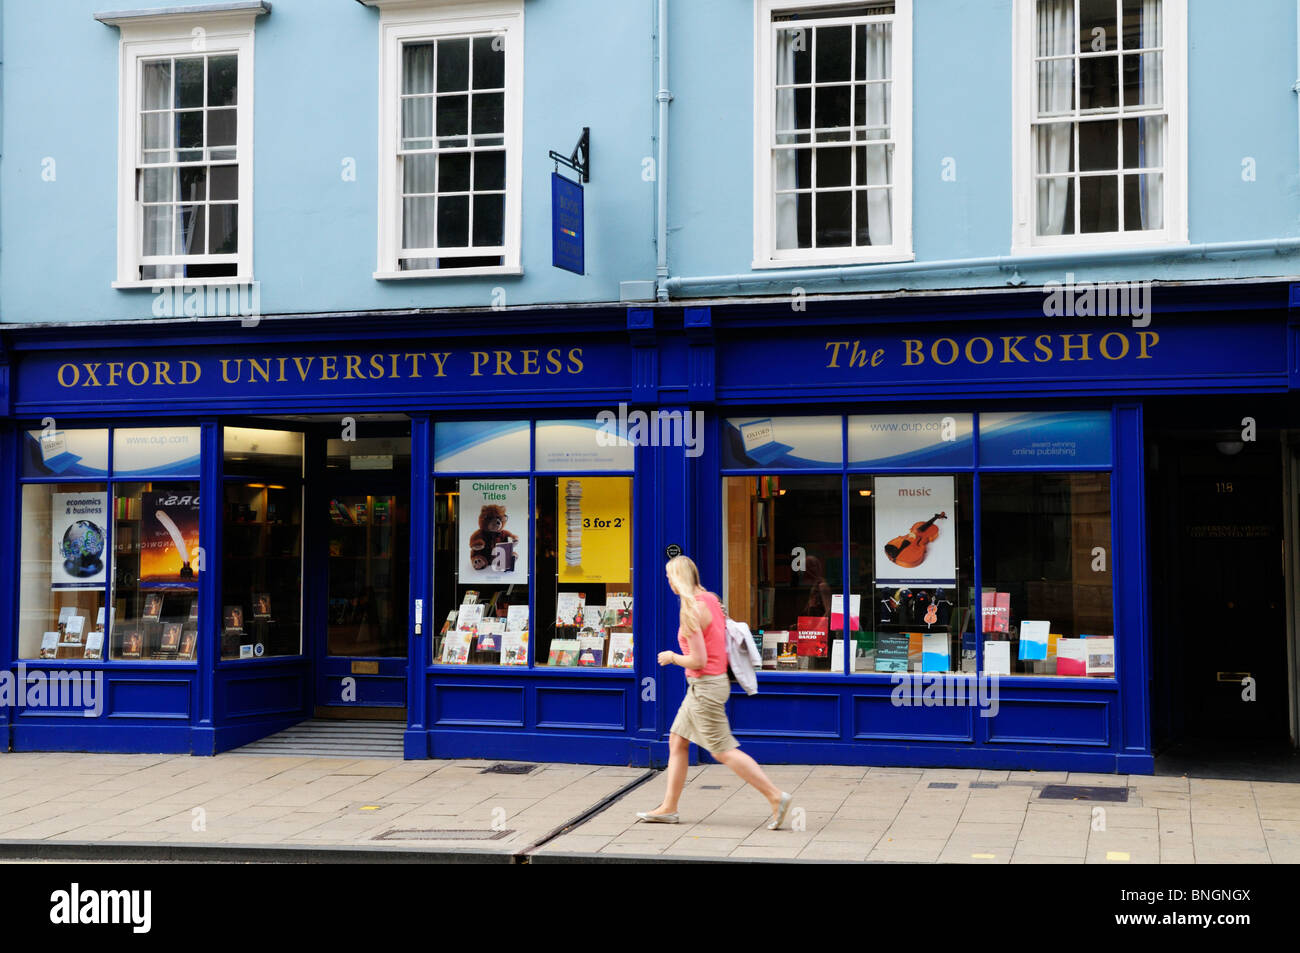 Oxford University Press Bookshop, Oxford, England, UK Stock